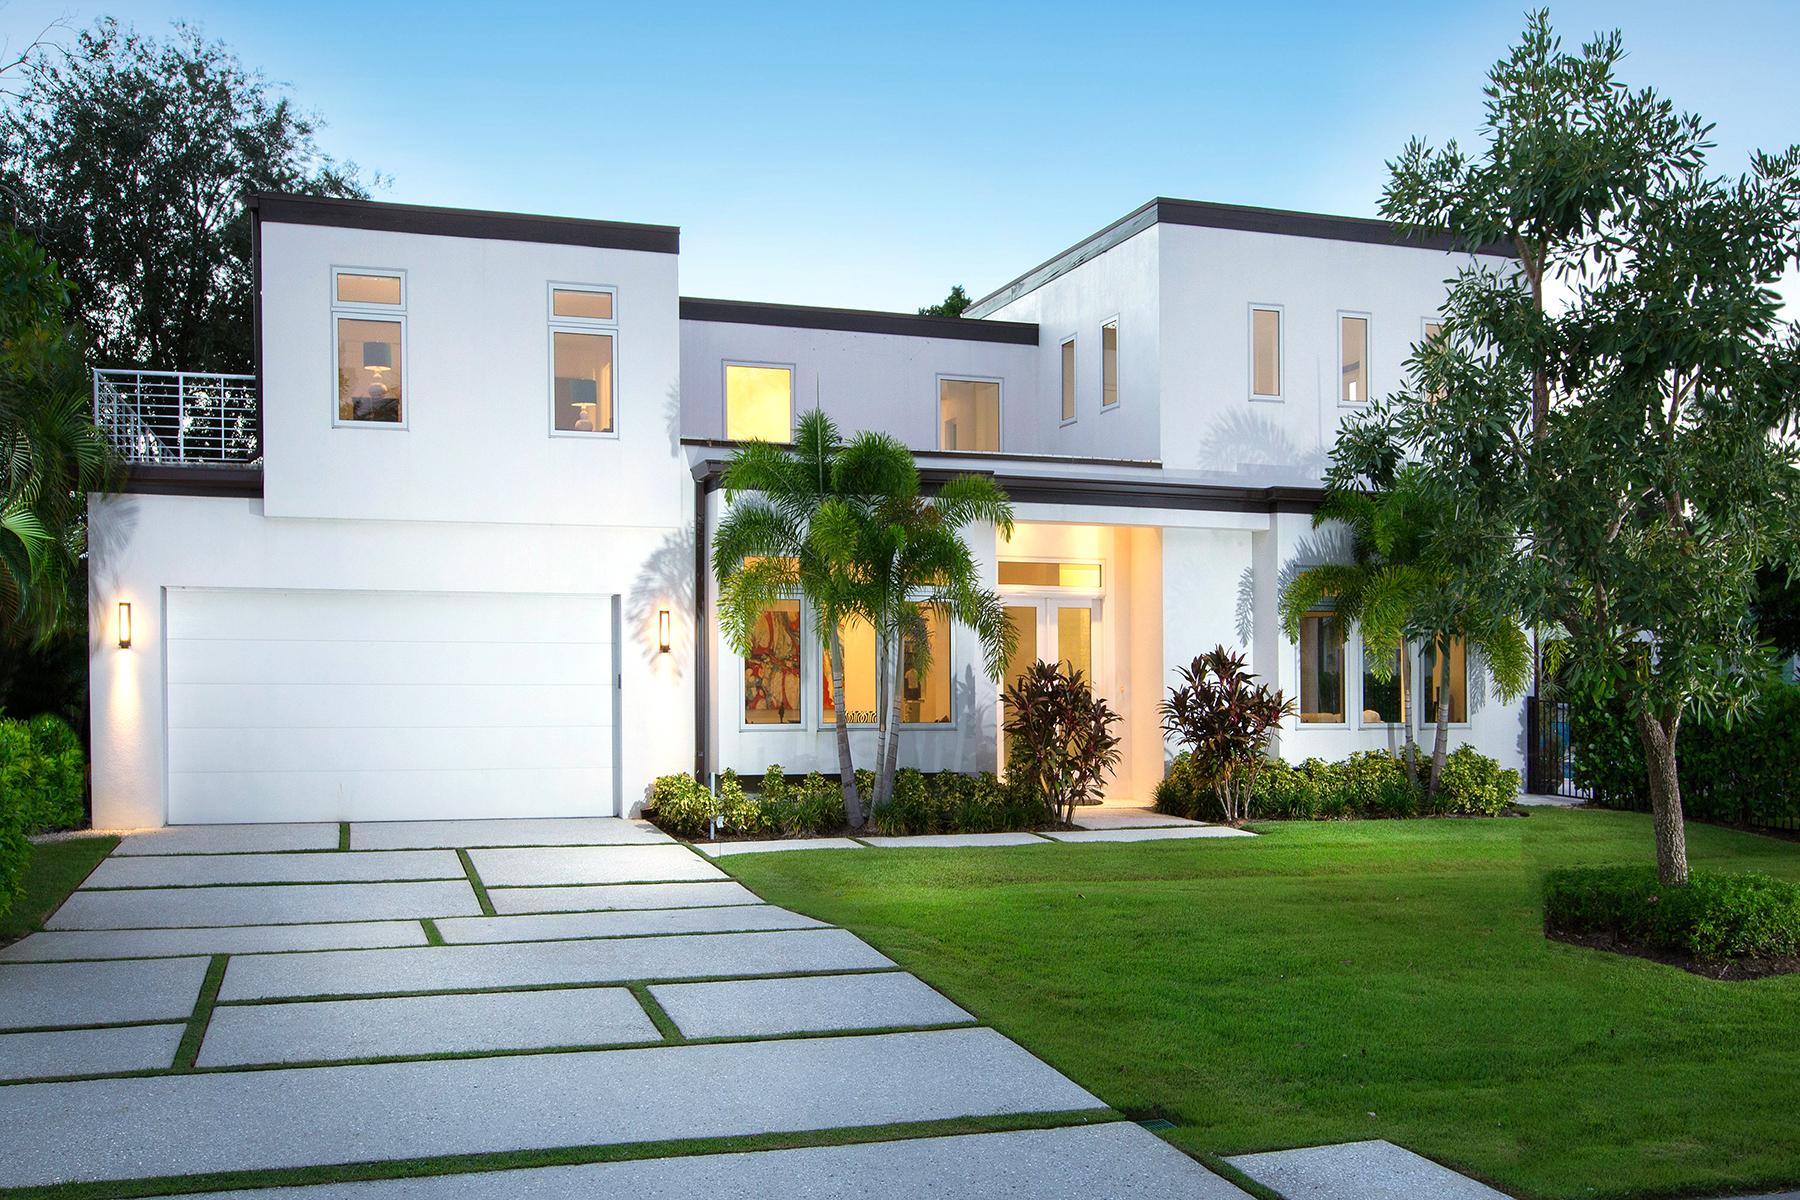 Casa para uma família para Venda às OLD NAPLES - RIDGE LAKE 689 Bougainvillea Rd Naples, Florida, 34102 Estados Unidos